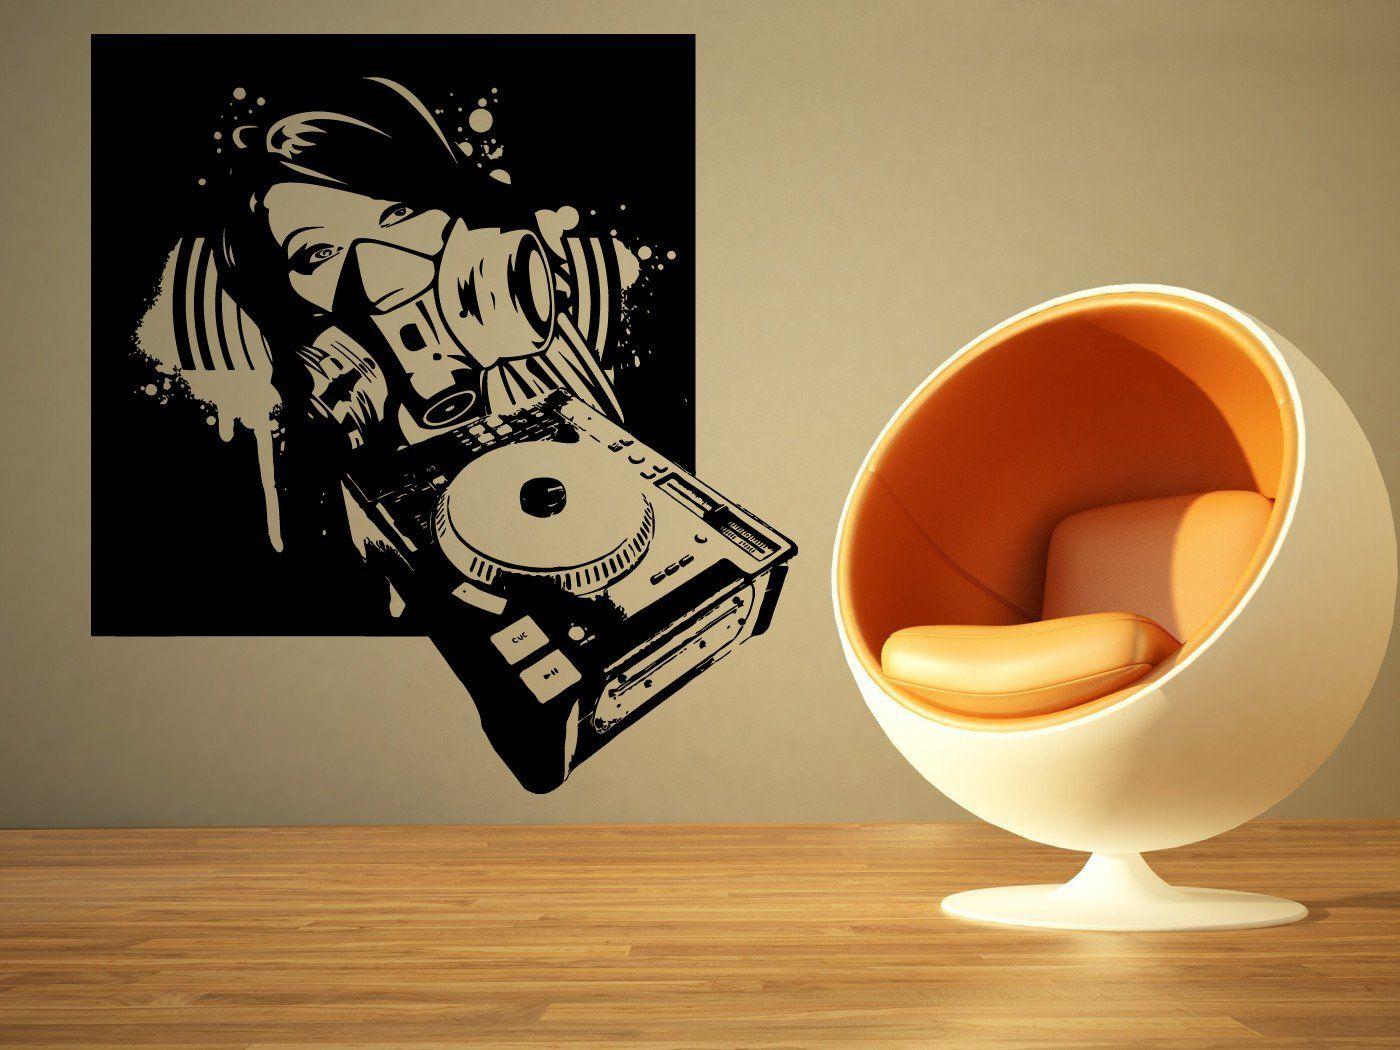 Wall Room Decor Art Vinyl Sticker Mural Decal Dj Girl Mask Music Big ...